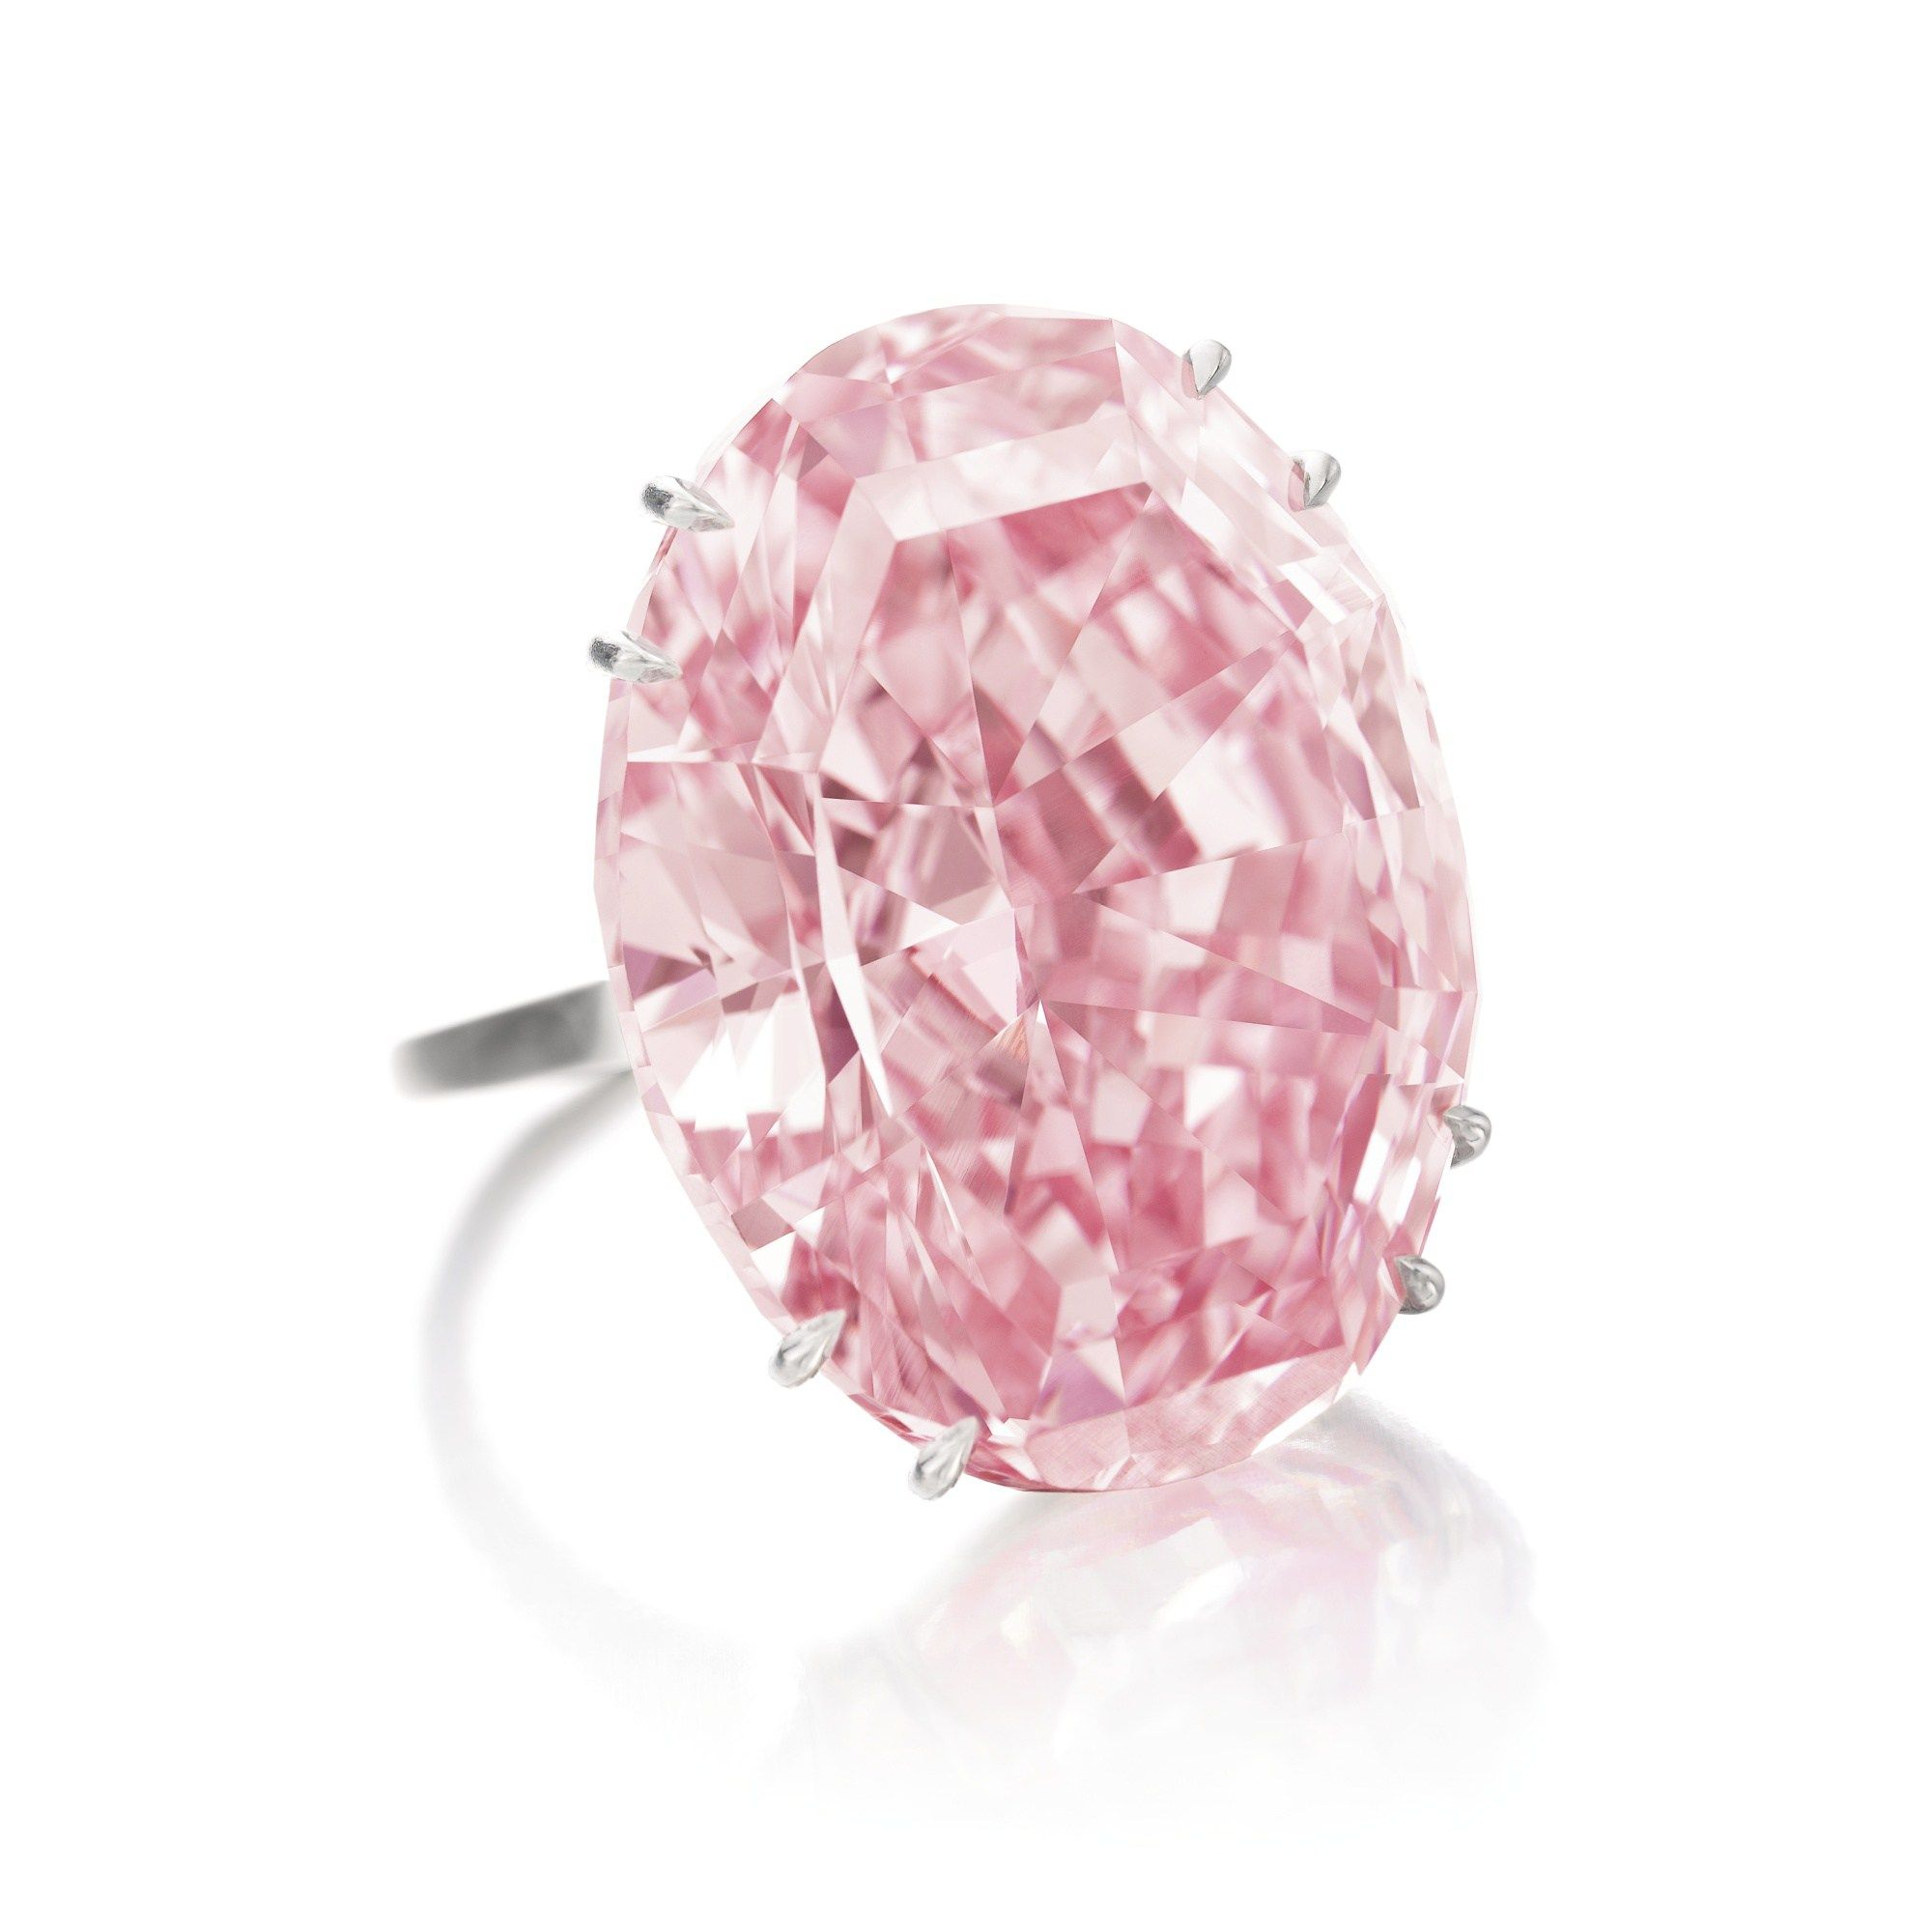 The+Rare+Graff+Pink+Diamond | Fashion & Design | Pinterest